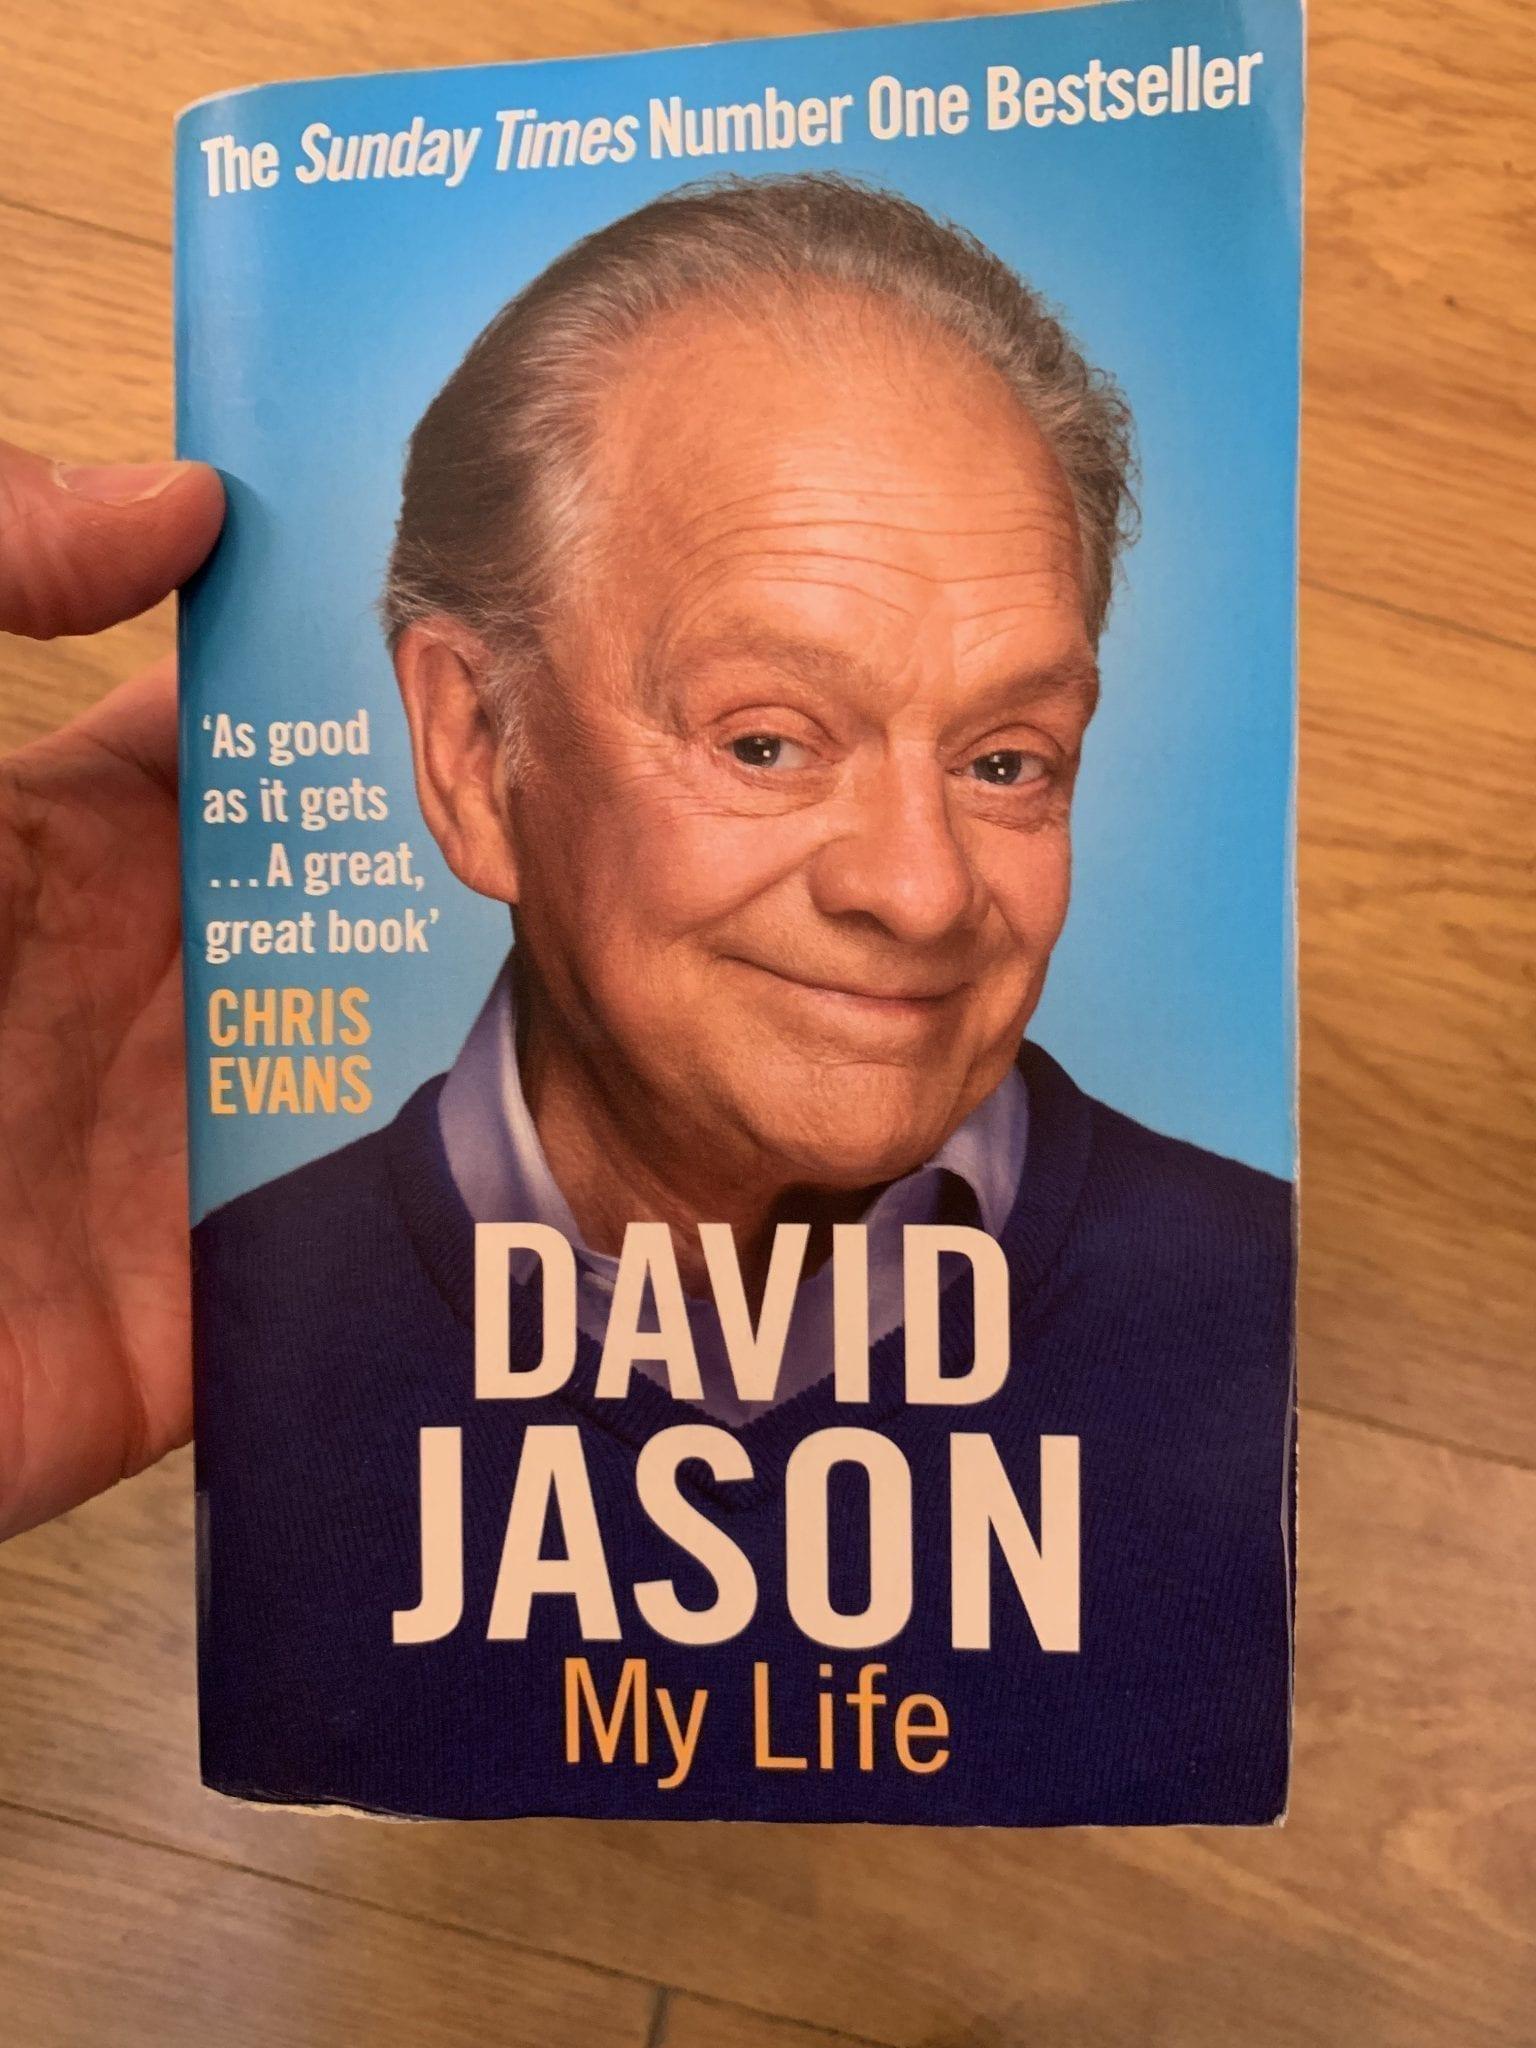 David Jason My Life, Book Cover